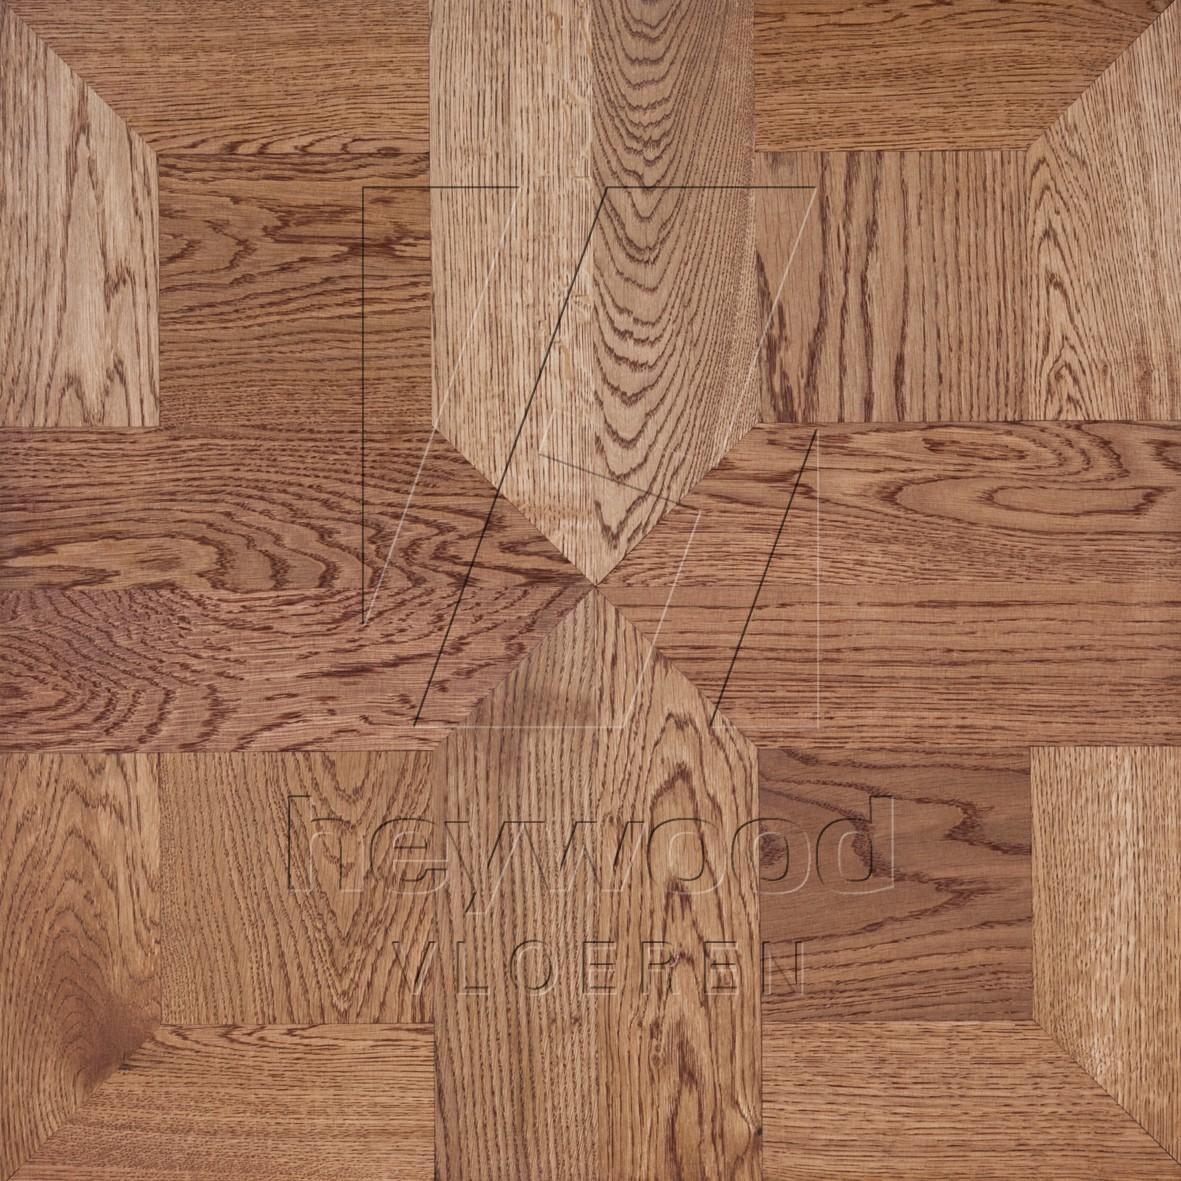 Empire 660 x 660 mm in Floor Panels & 3D Wall Panels of Pattern & Panel Floors